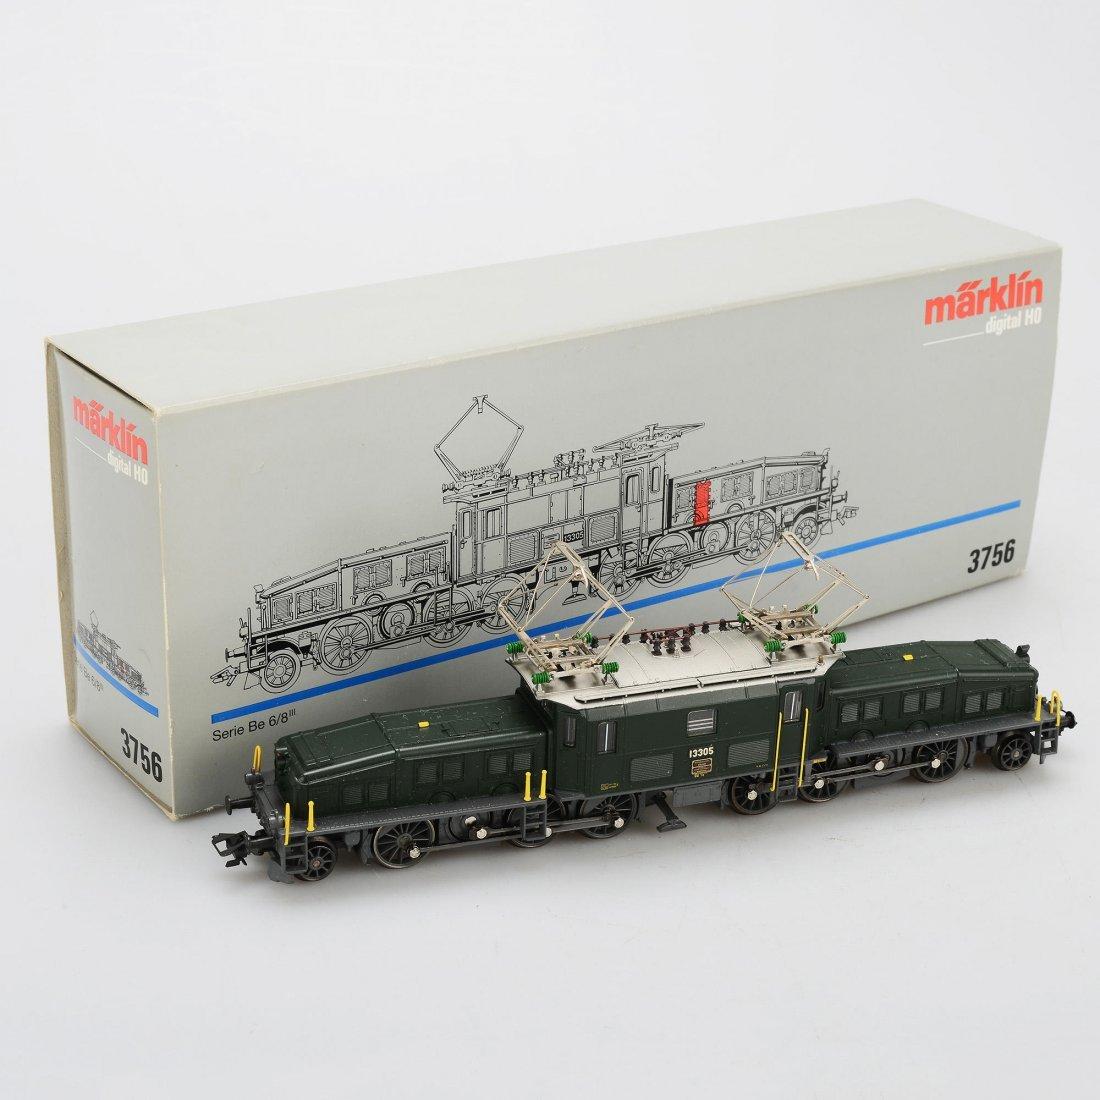 ELLOK, 3756, Marklin, Digital H0